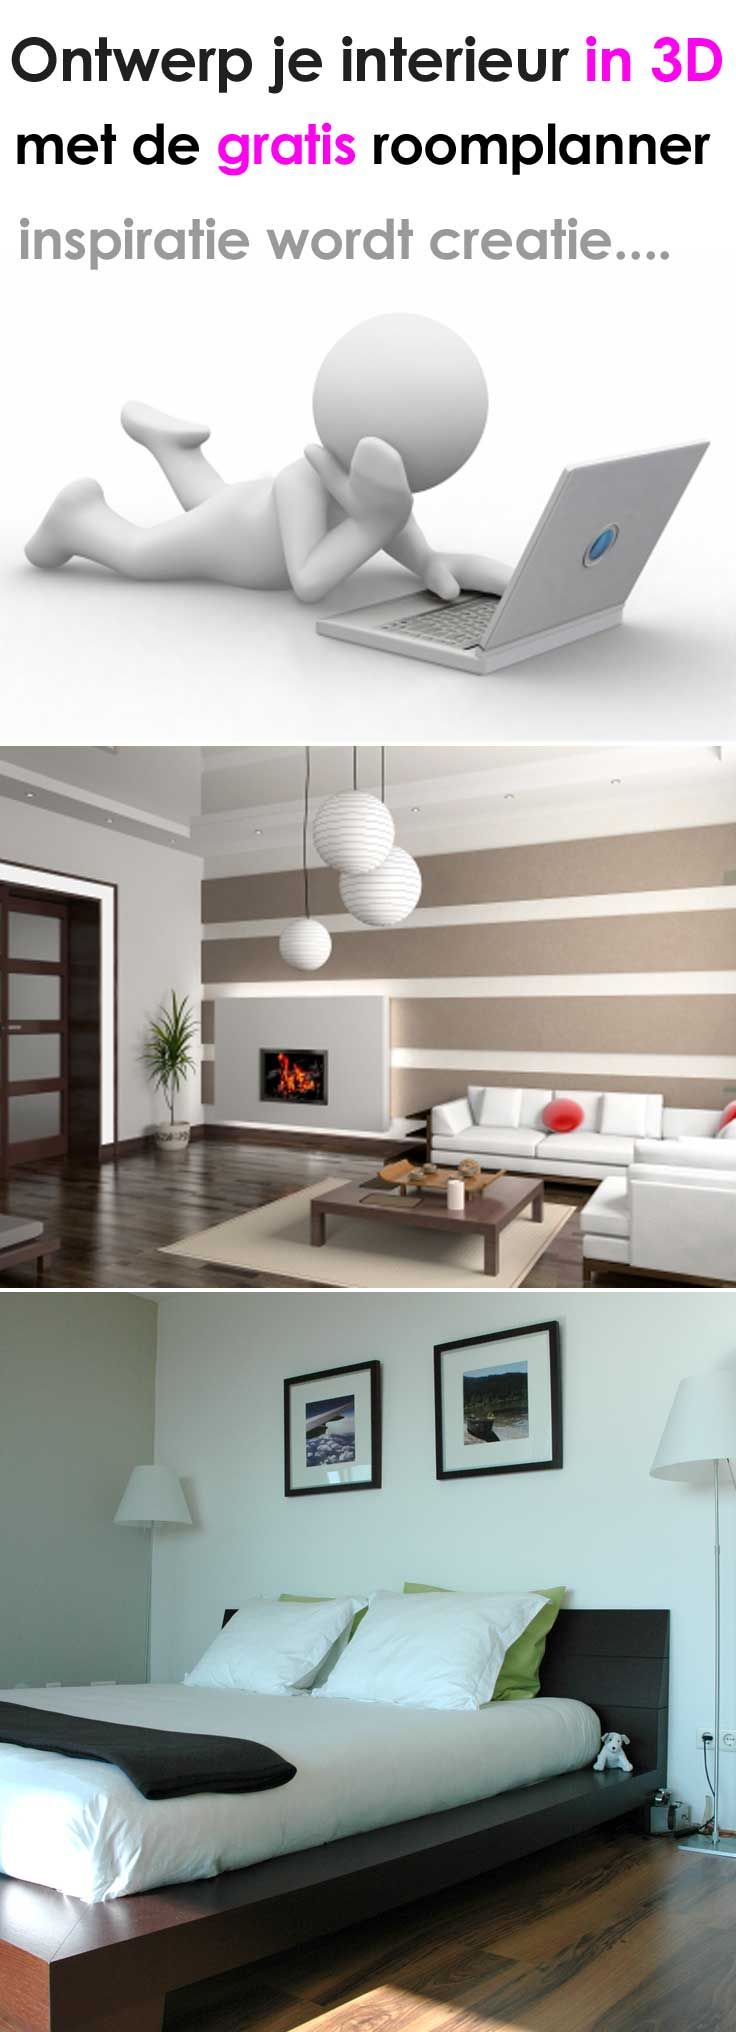 25 beste idee n over interieur ontwerpen op pinterest for Interieur ontwerpen online gratis